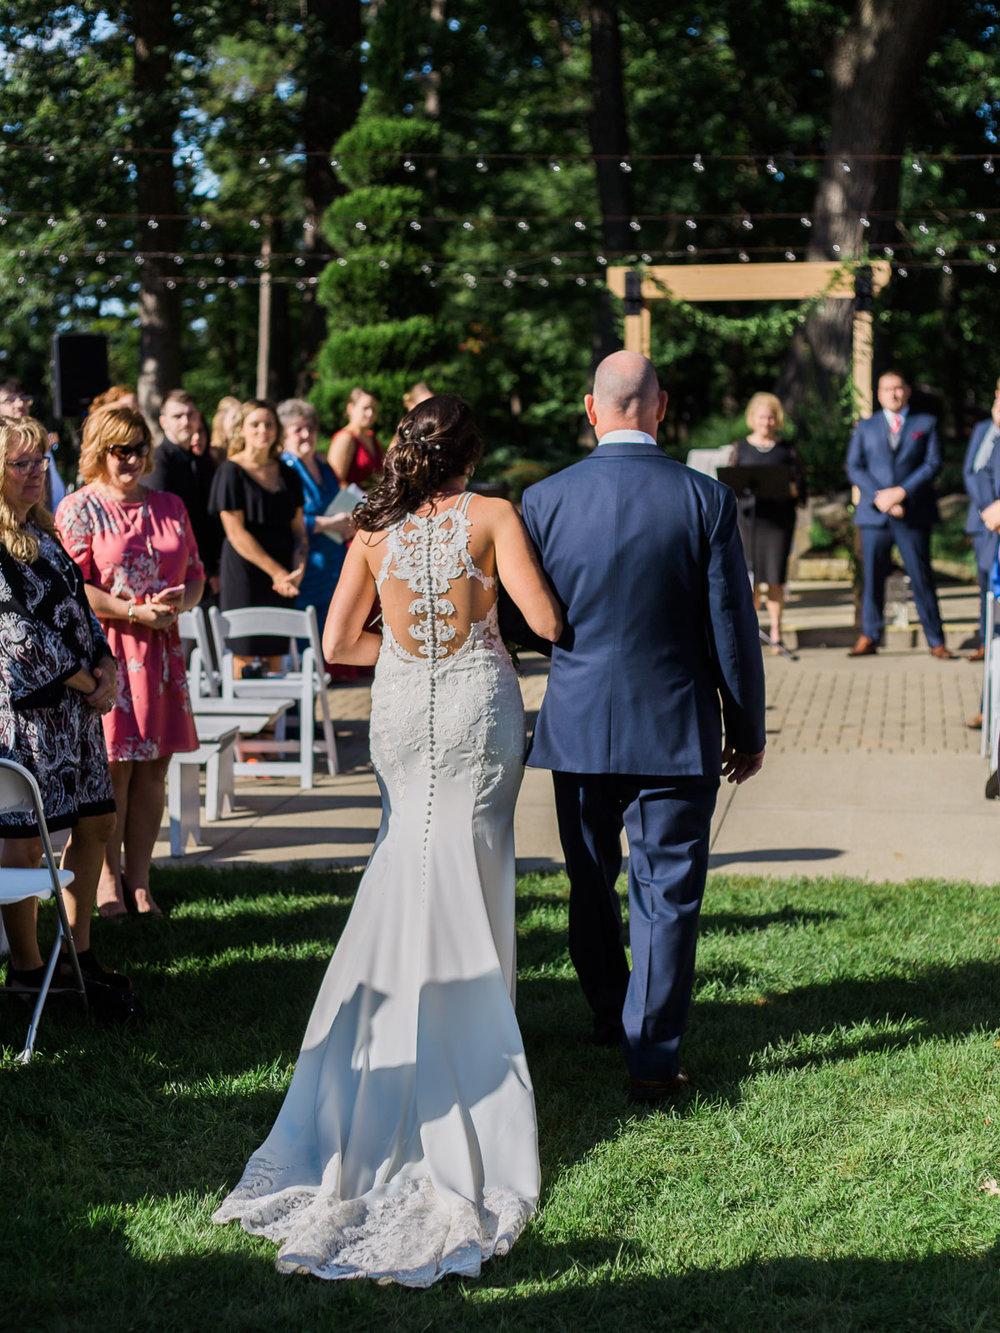 elegant-hoover-hall-wedding-photos-by-matt-erickson-photography-5.jpg